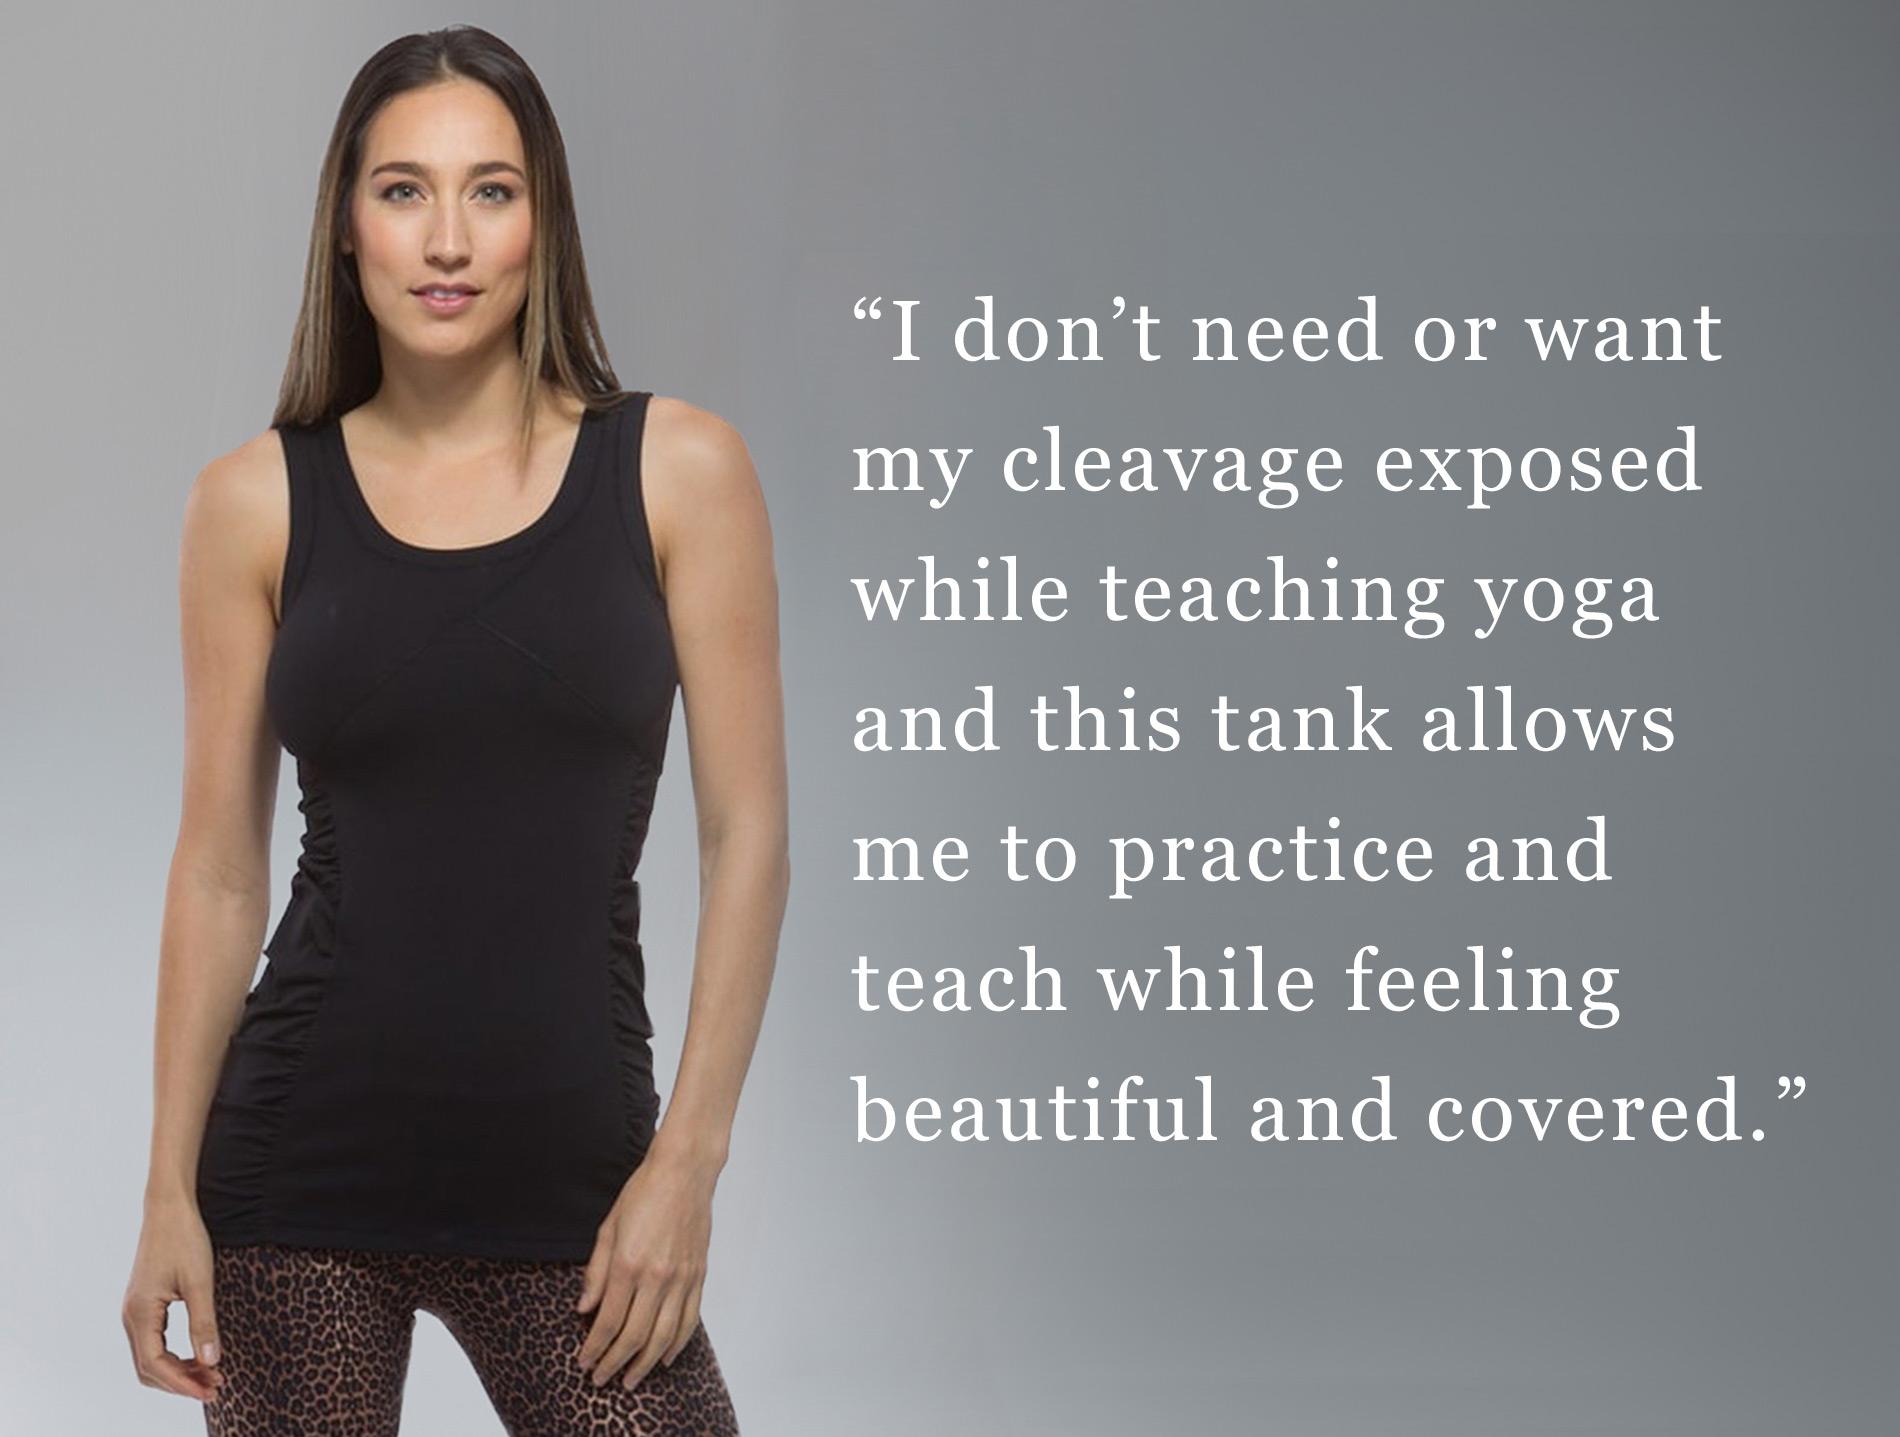 goddess-yoga-tank-quote.jpg